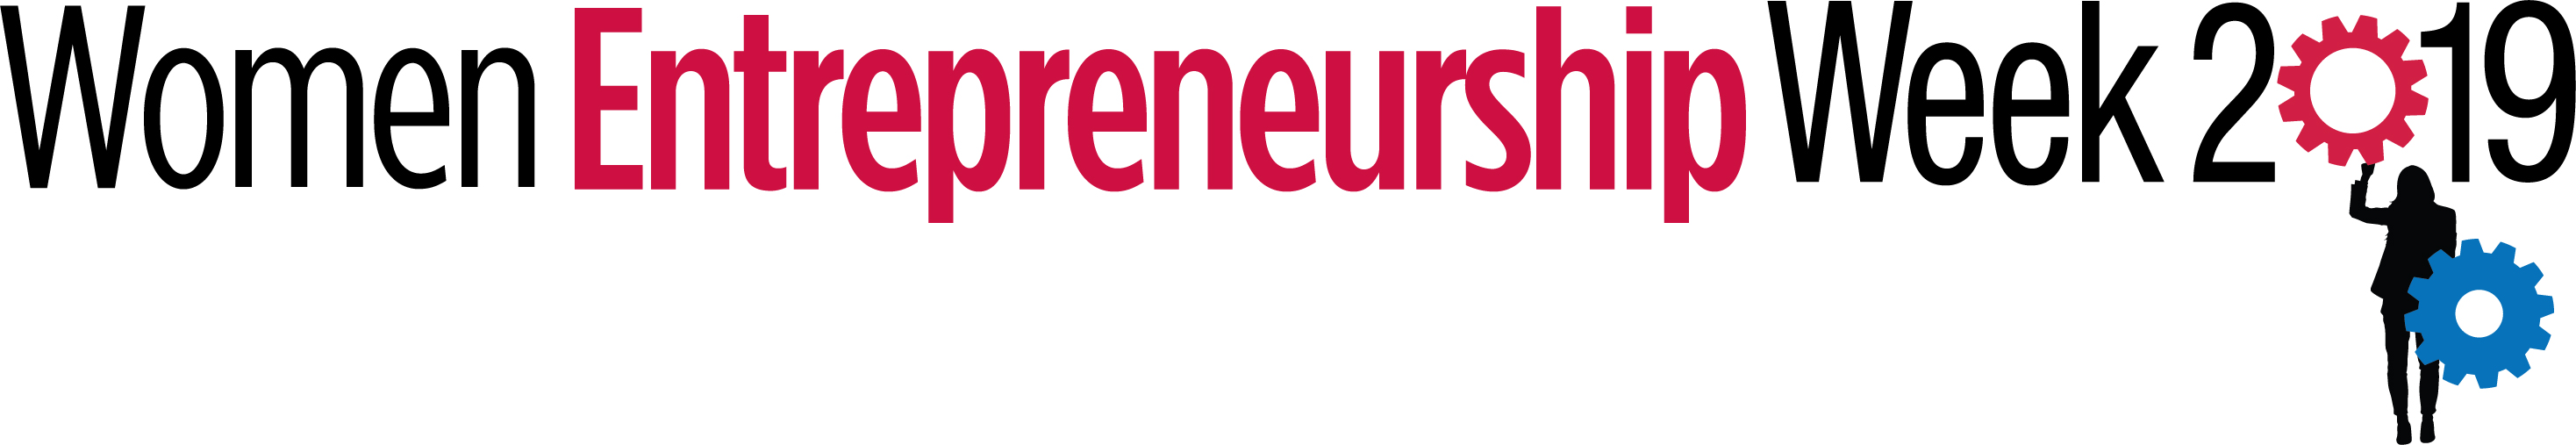 Women entrepreneurship week 2019